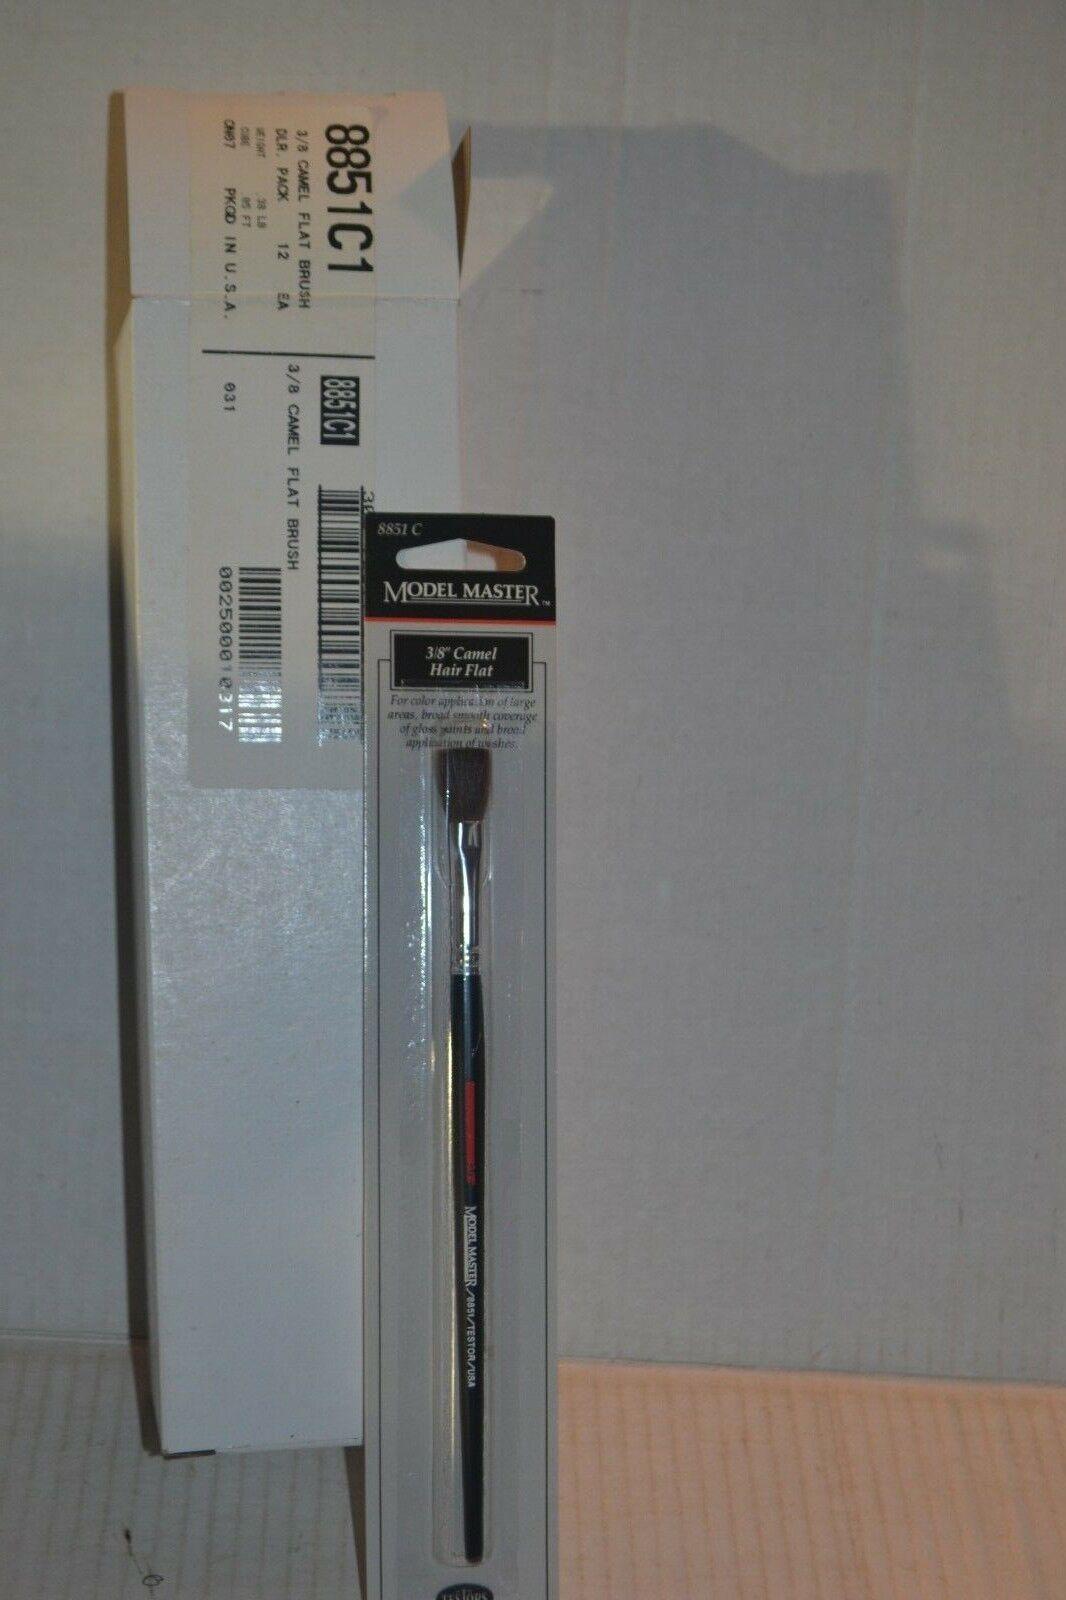 12 Testors Model Master 8851c 3 8 Camel Hair Flat Paint Brush